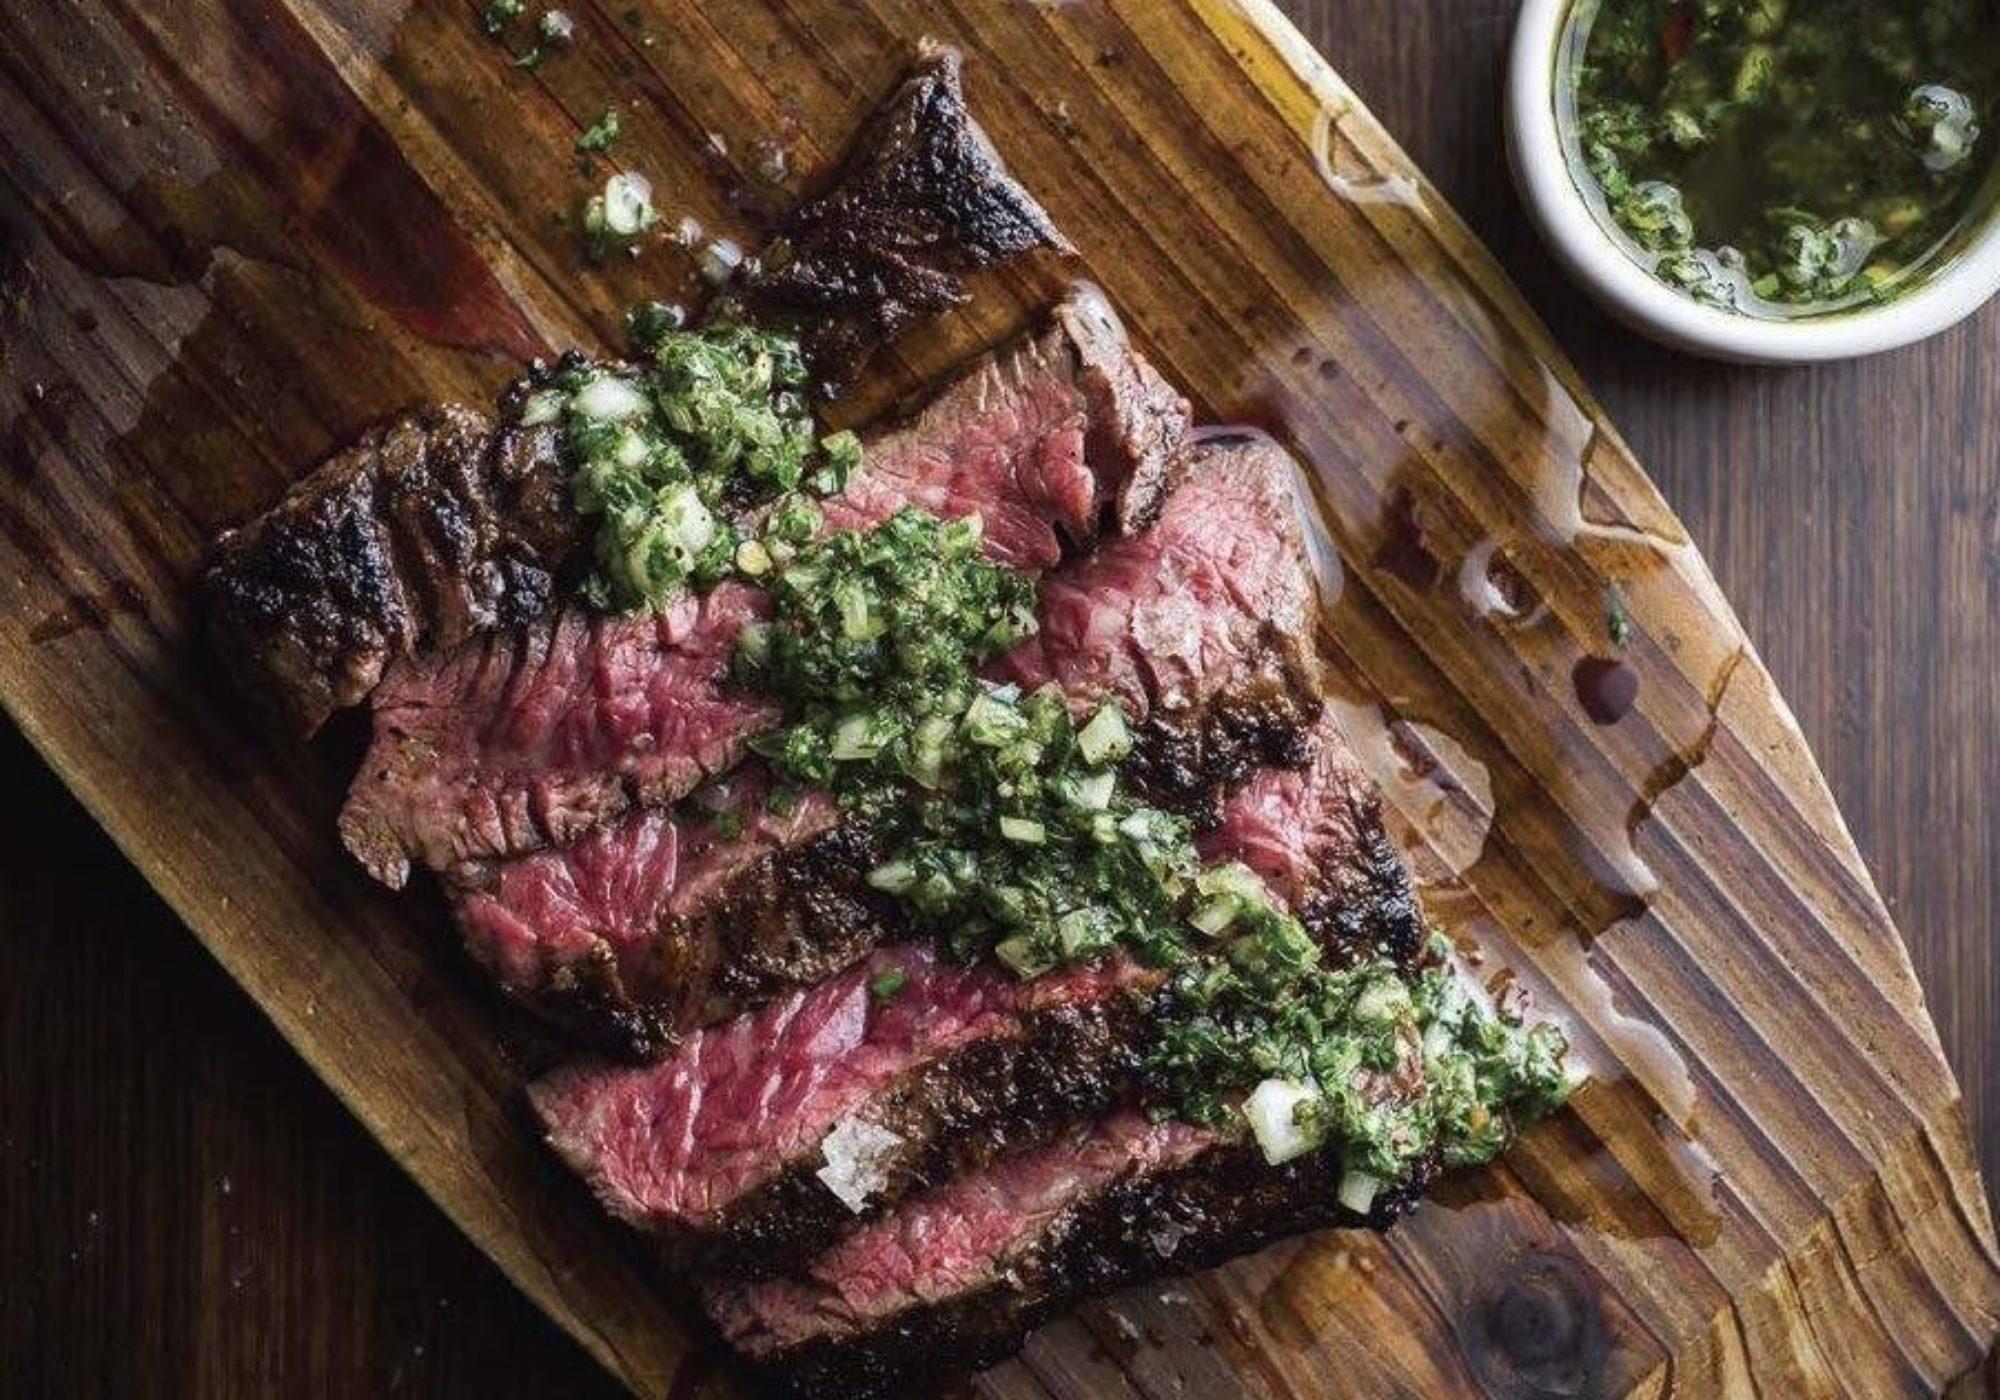 Grilled-Beef-Skirt-Steak-Evan-Sung